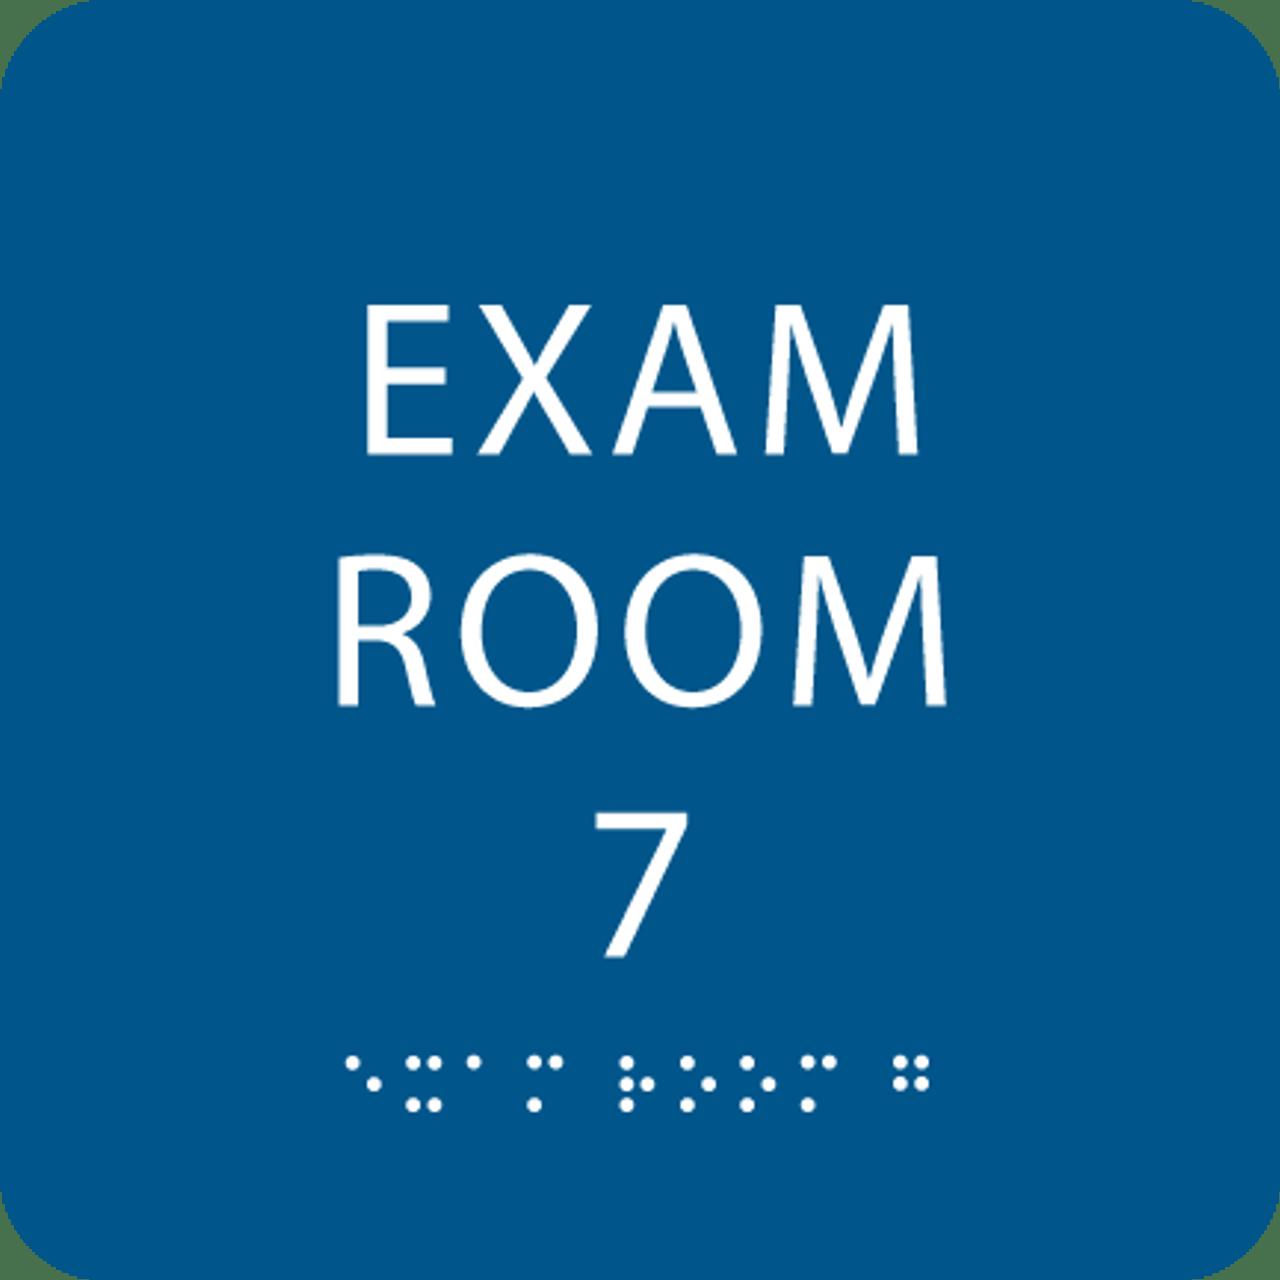 Blue Exam Room 7 Sign w/ ADA Braille